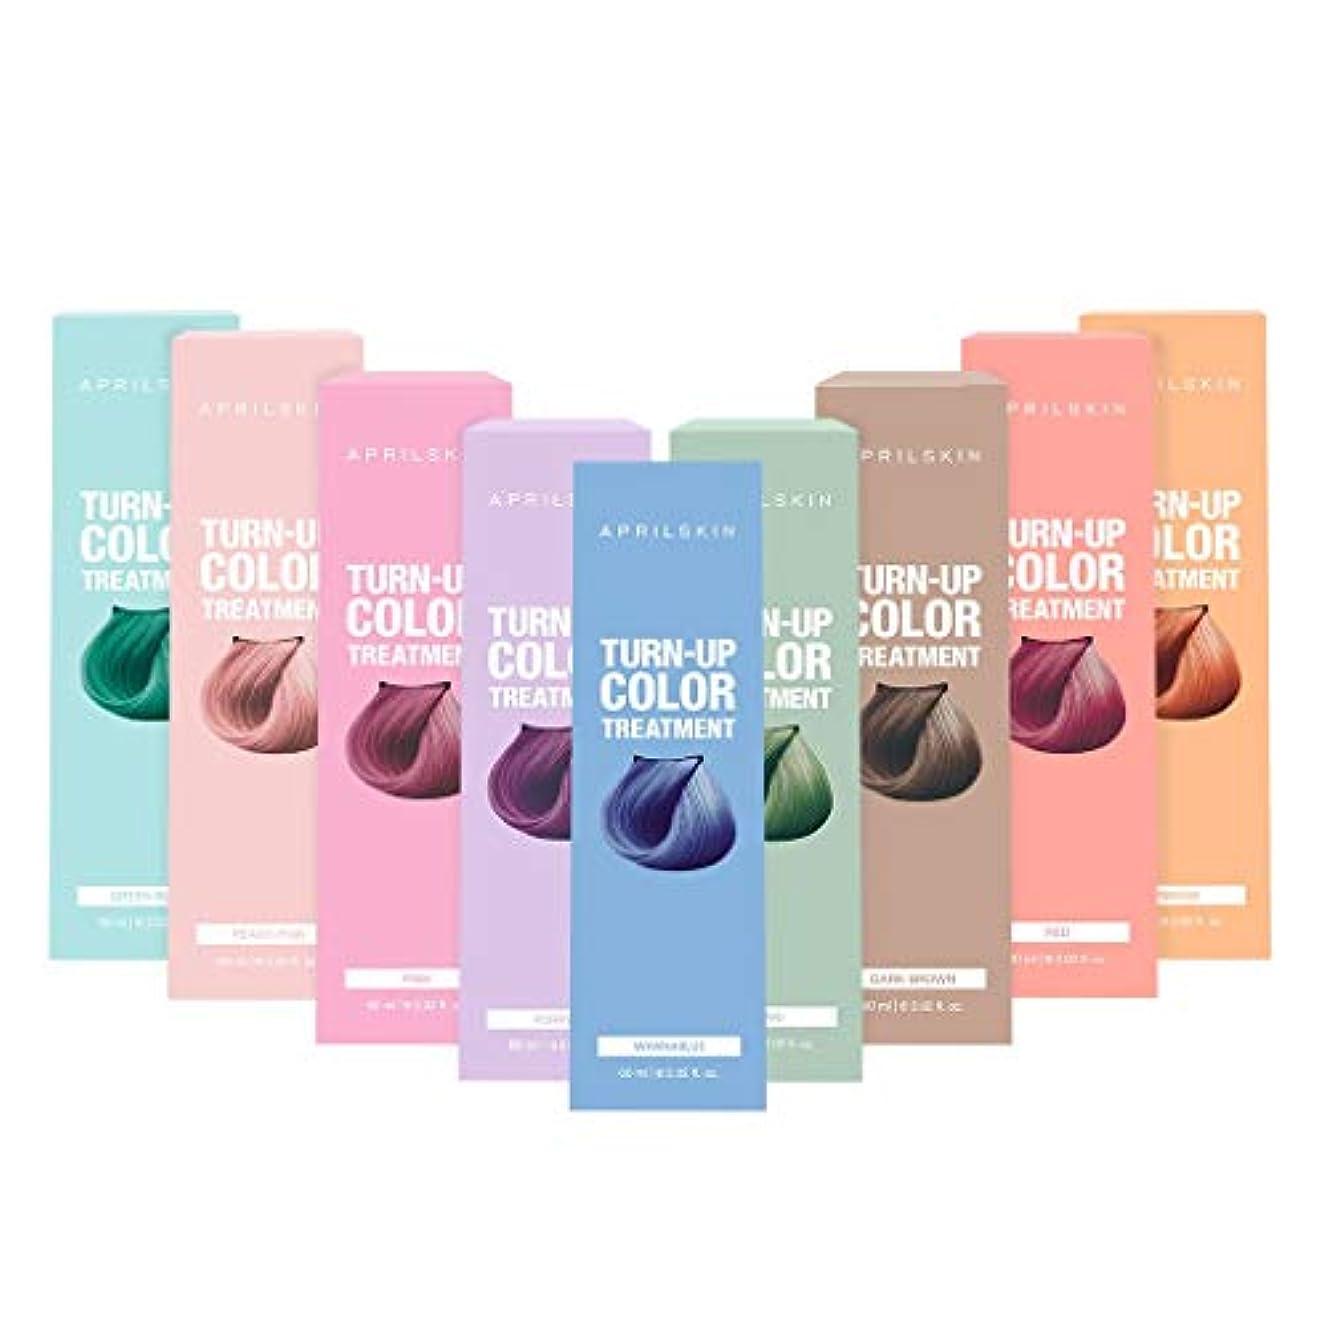 April Skin Turn up Color Treatment★ビッグセール★ターンアップカラートリートメント60ml (Dark Brown)/ヘアダイ/トリートメント/K-Beauty